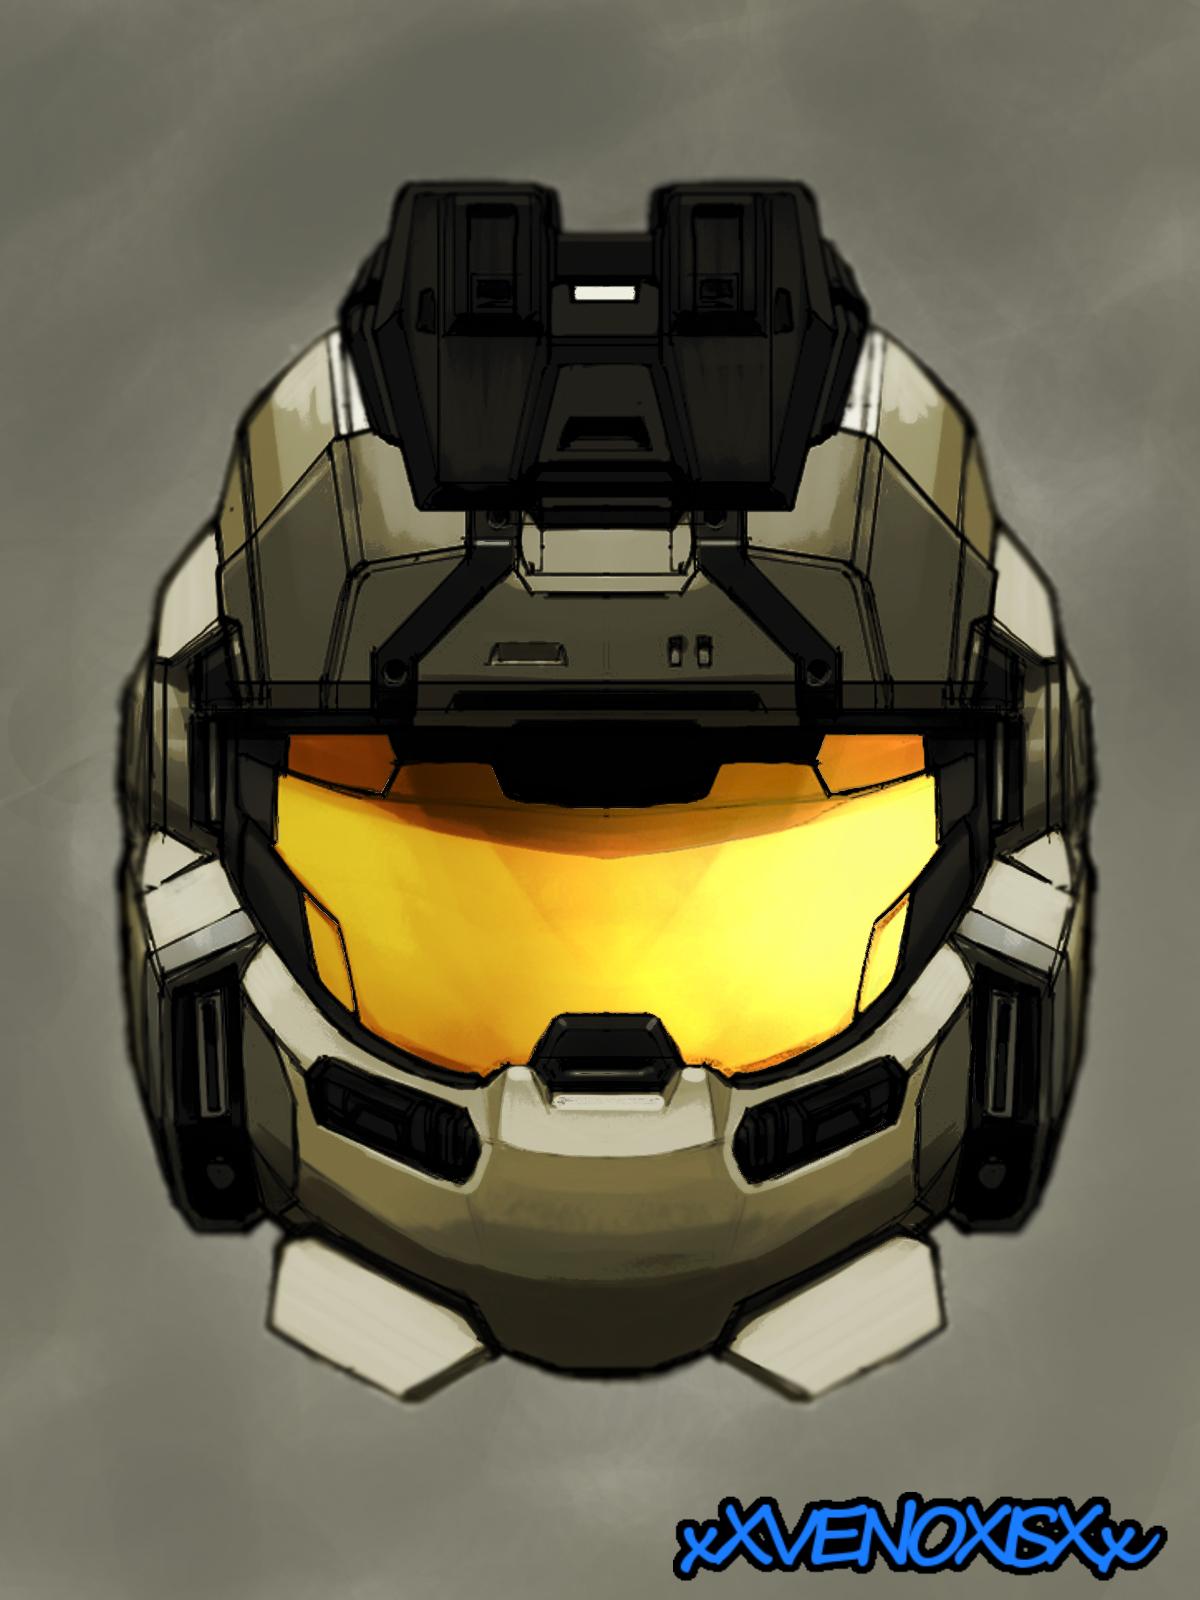 halo reach jorge helmet by xXVENOXISXx on DeviantArt